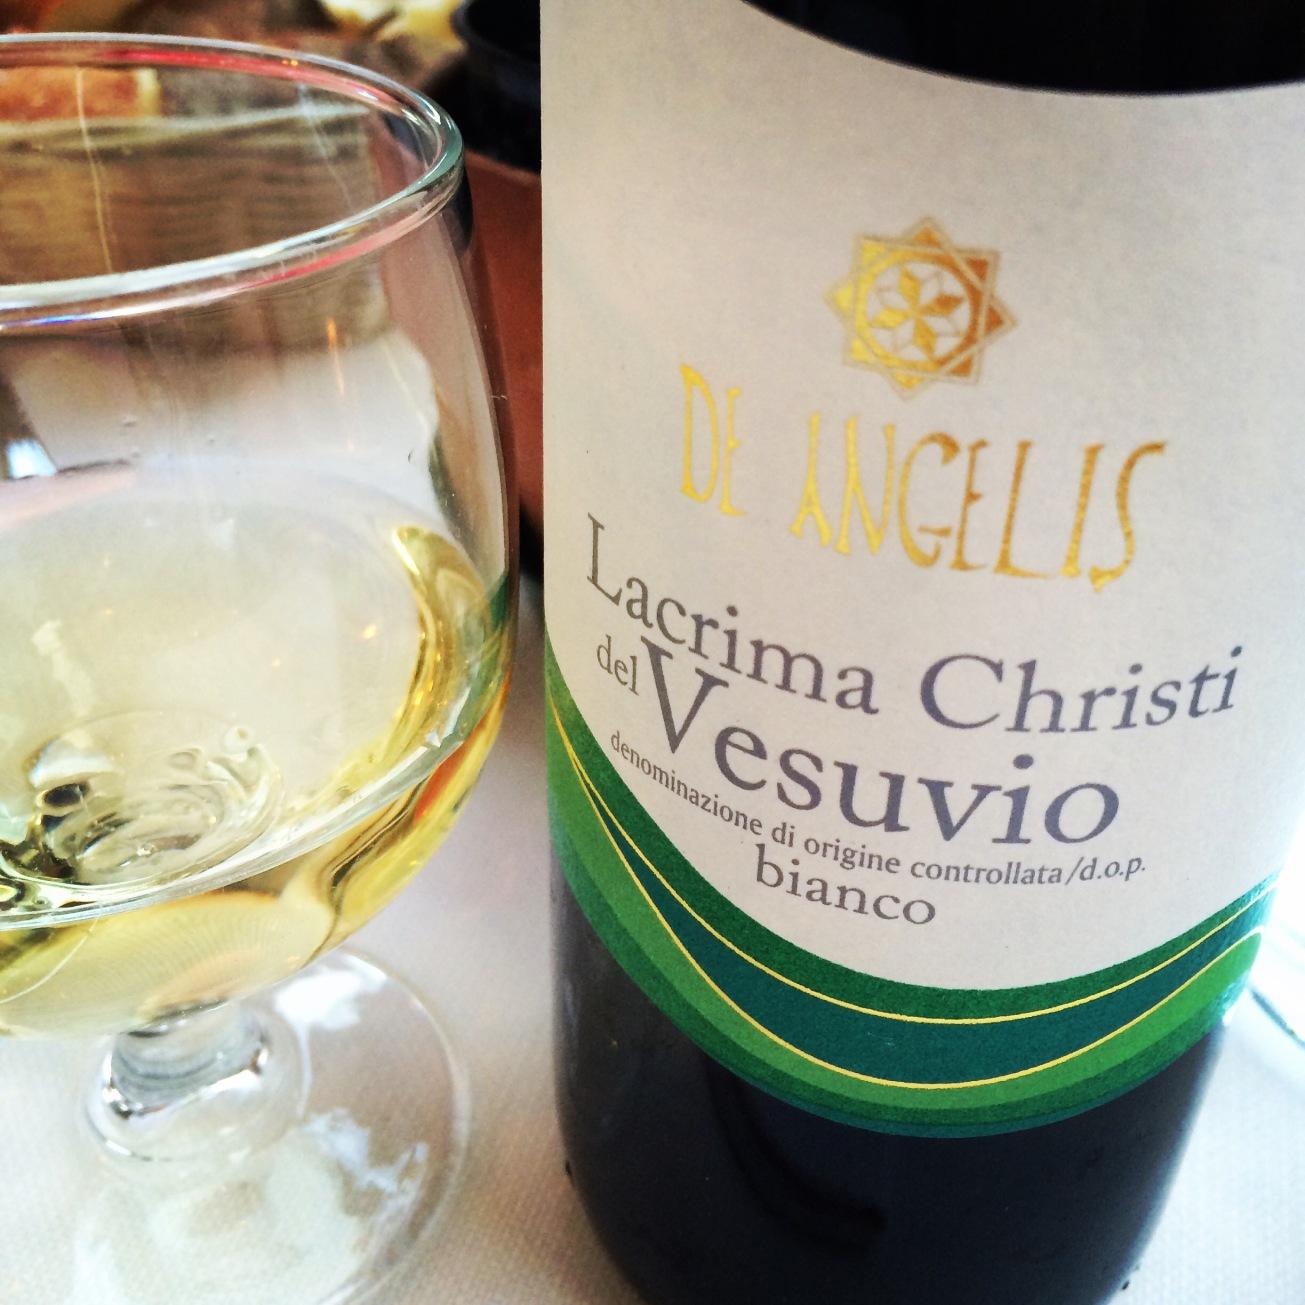 2013 De Angelis Lacryma Christi del Vesuvio